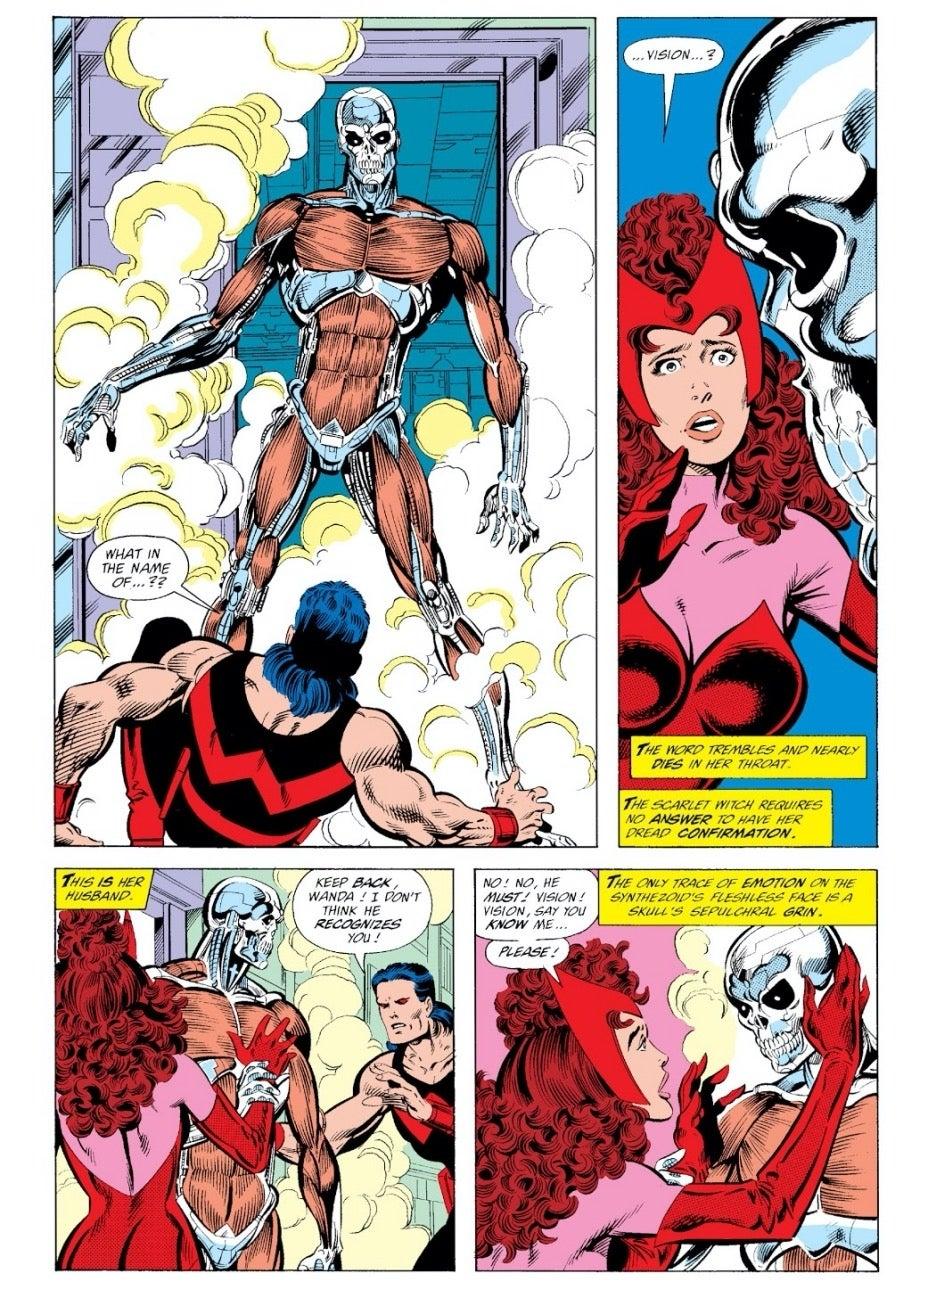 West Coast Avengers 44 Vision